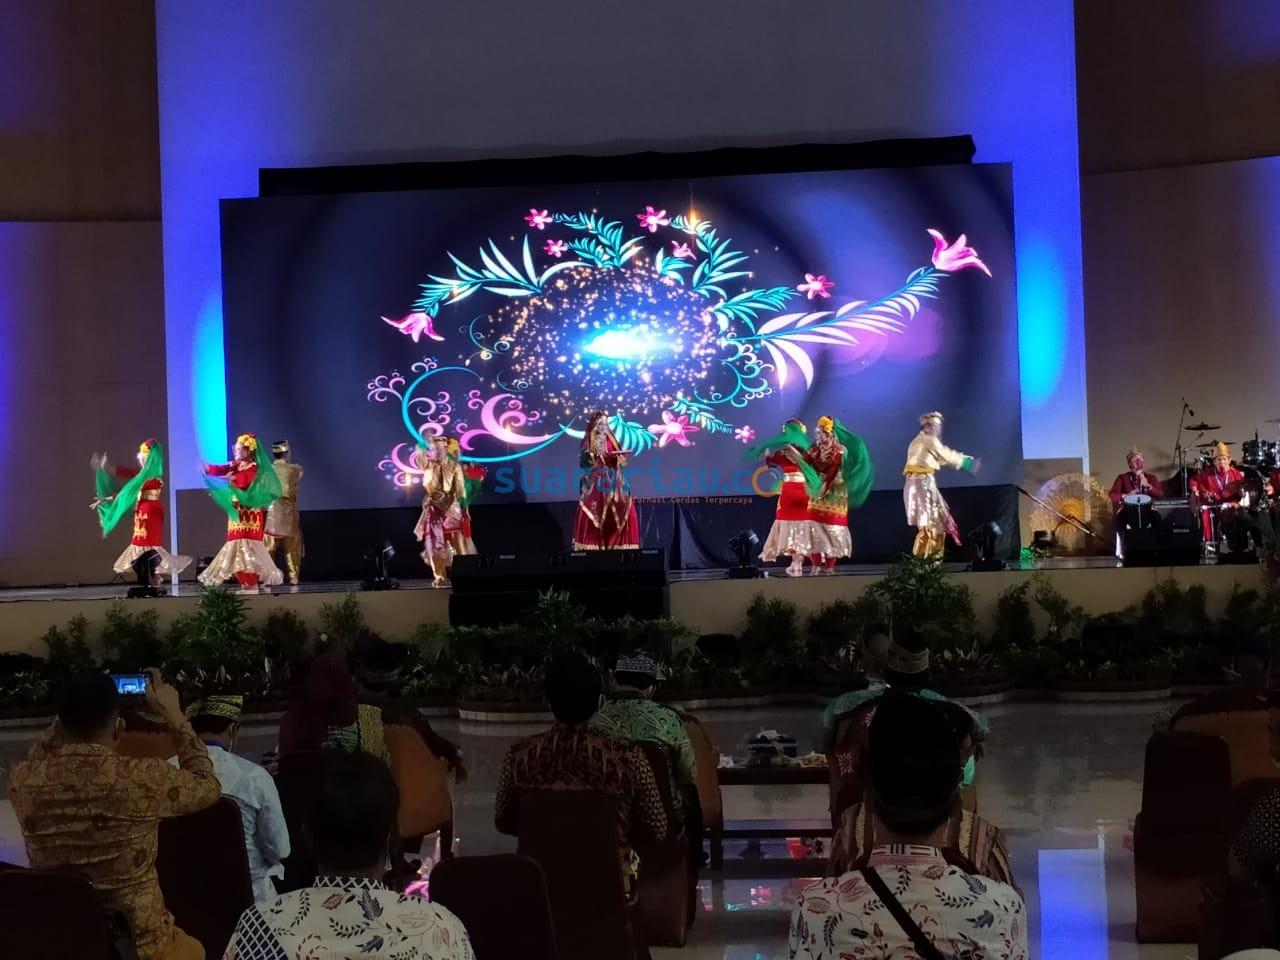 Tari Ratu Sinuhun persembahan Daerah Palembang, Peserta Rakernas JKPI yang berlangsung di Gedung Daerah Sultan Syarif Kasim II Siak